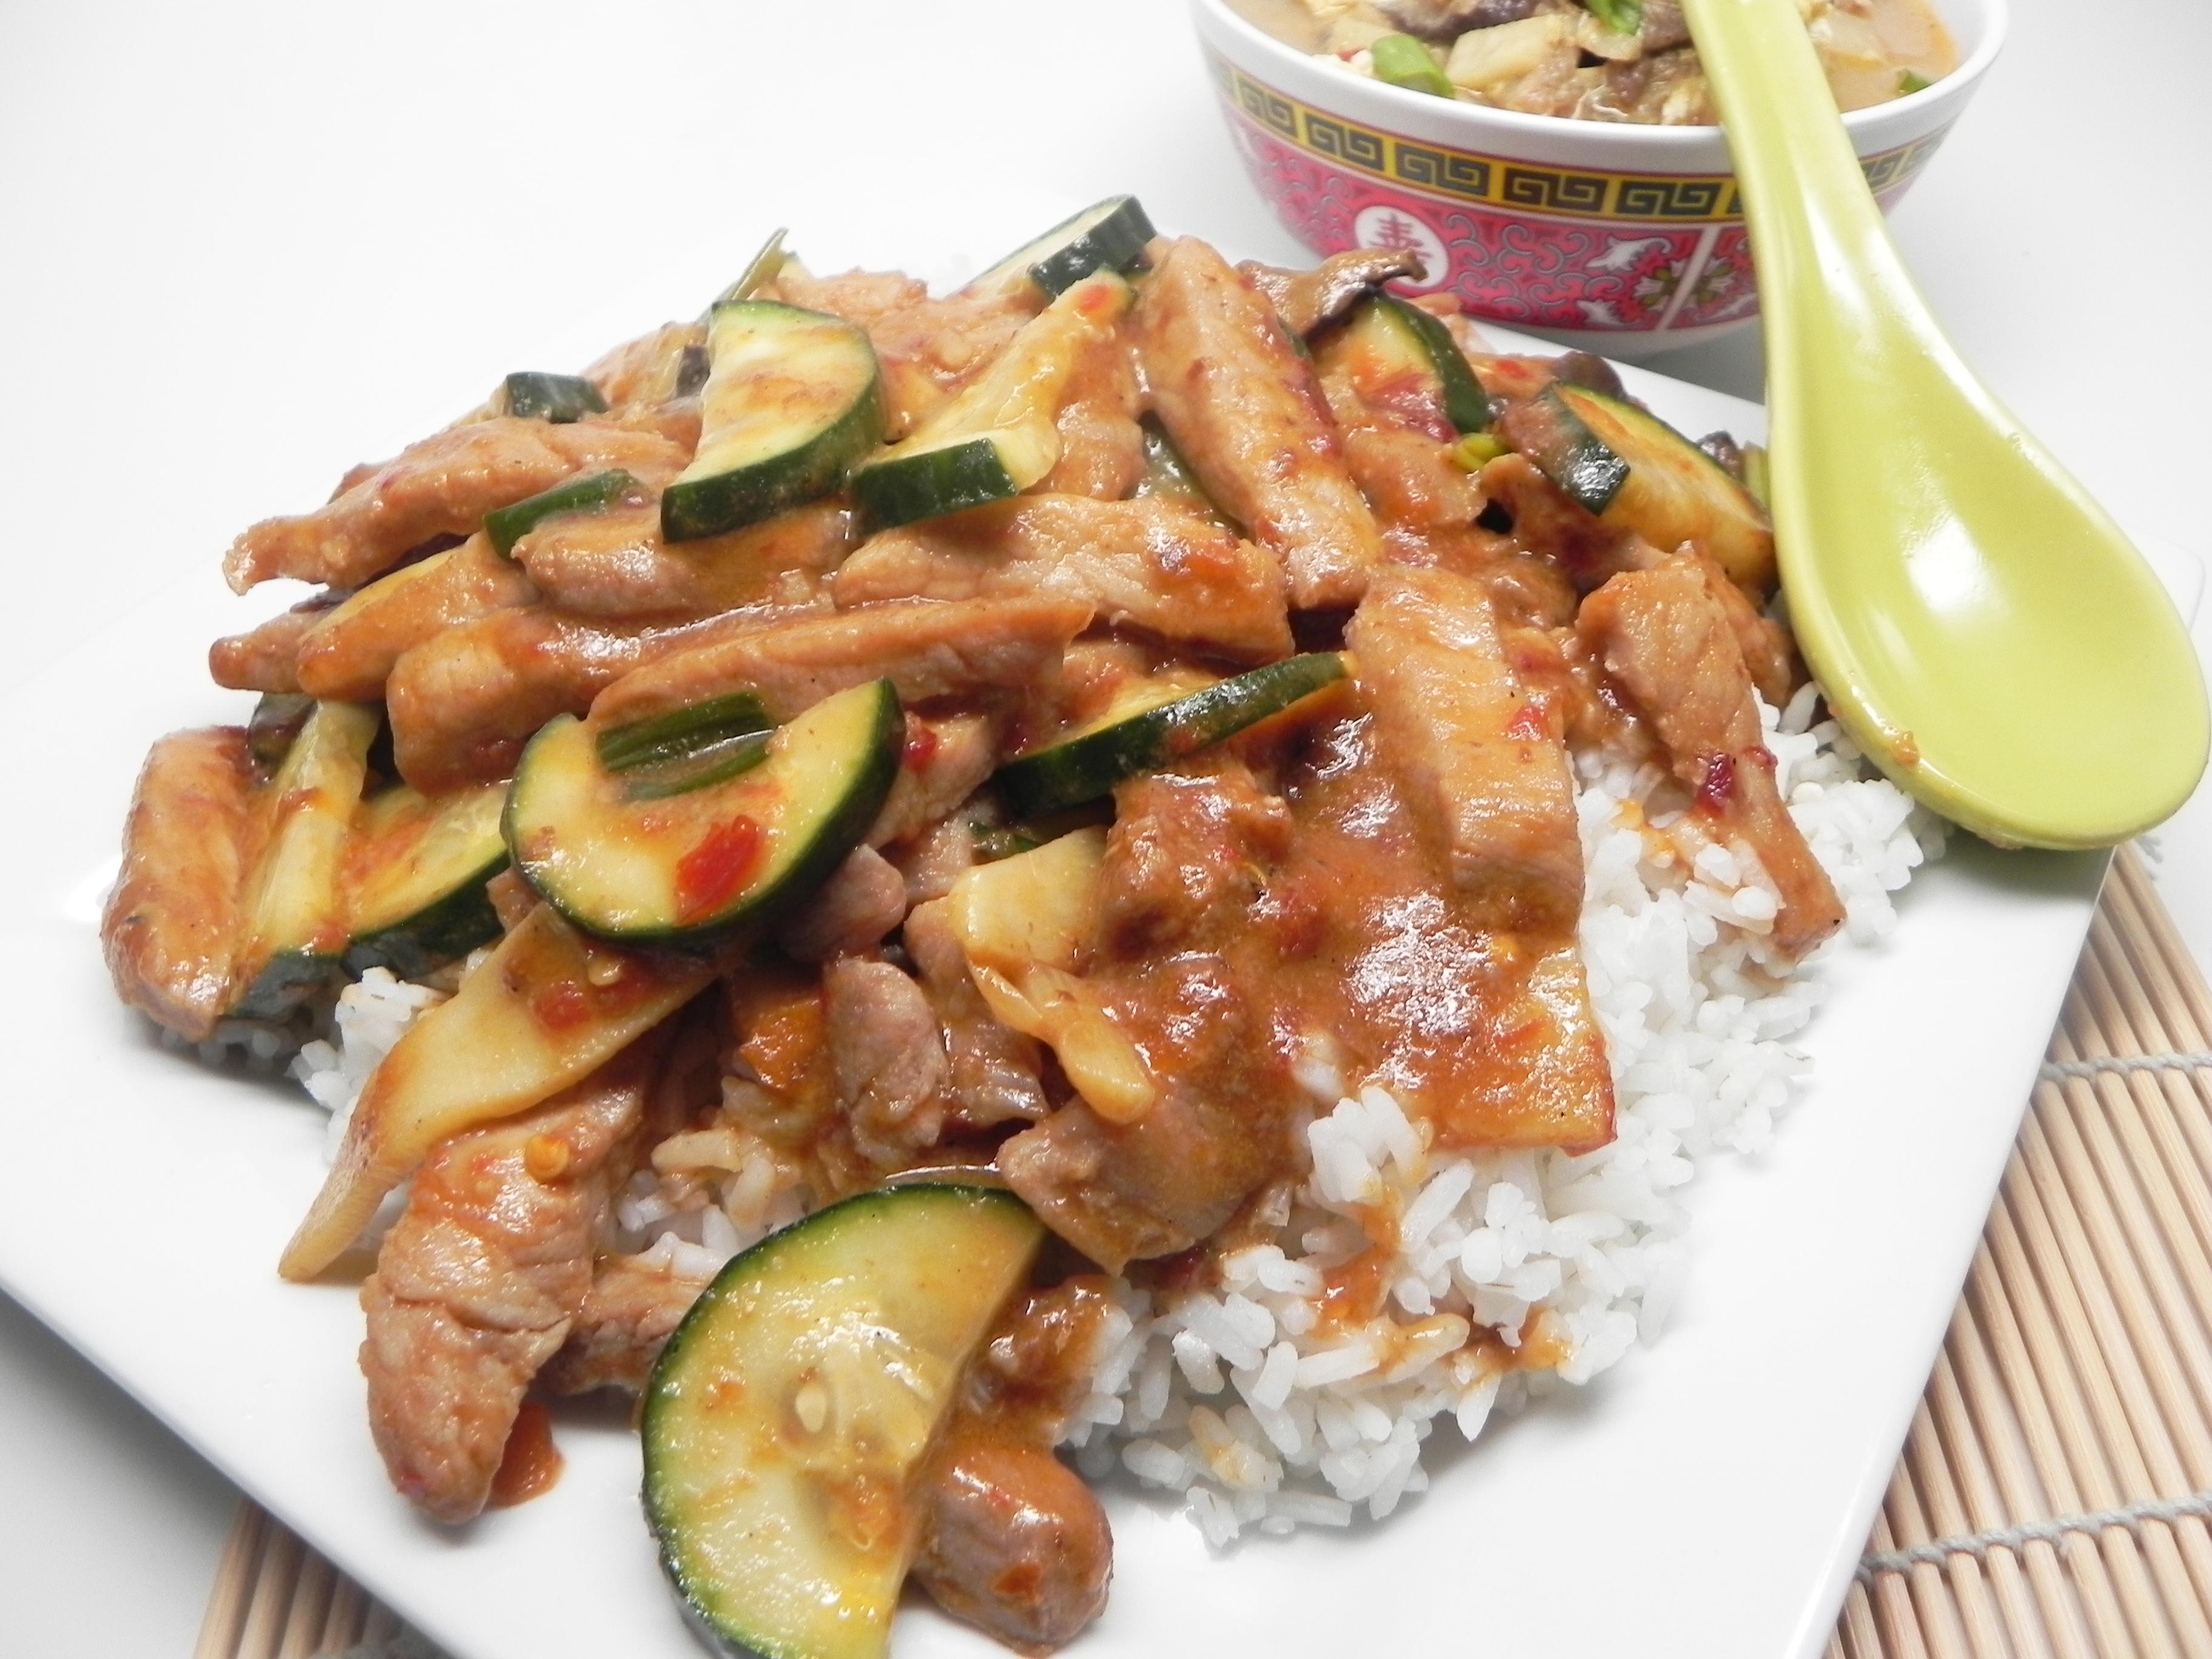 Sichuan Pork Stir-Fry Jin